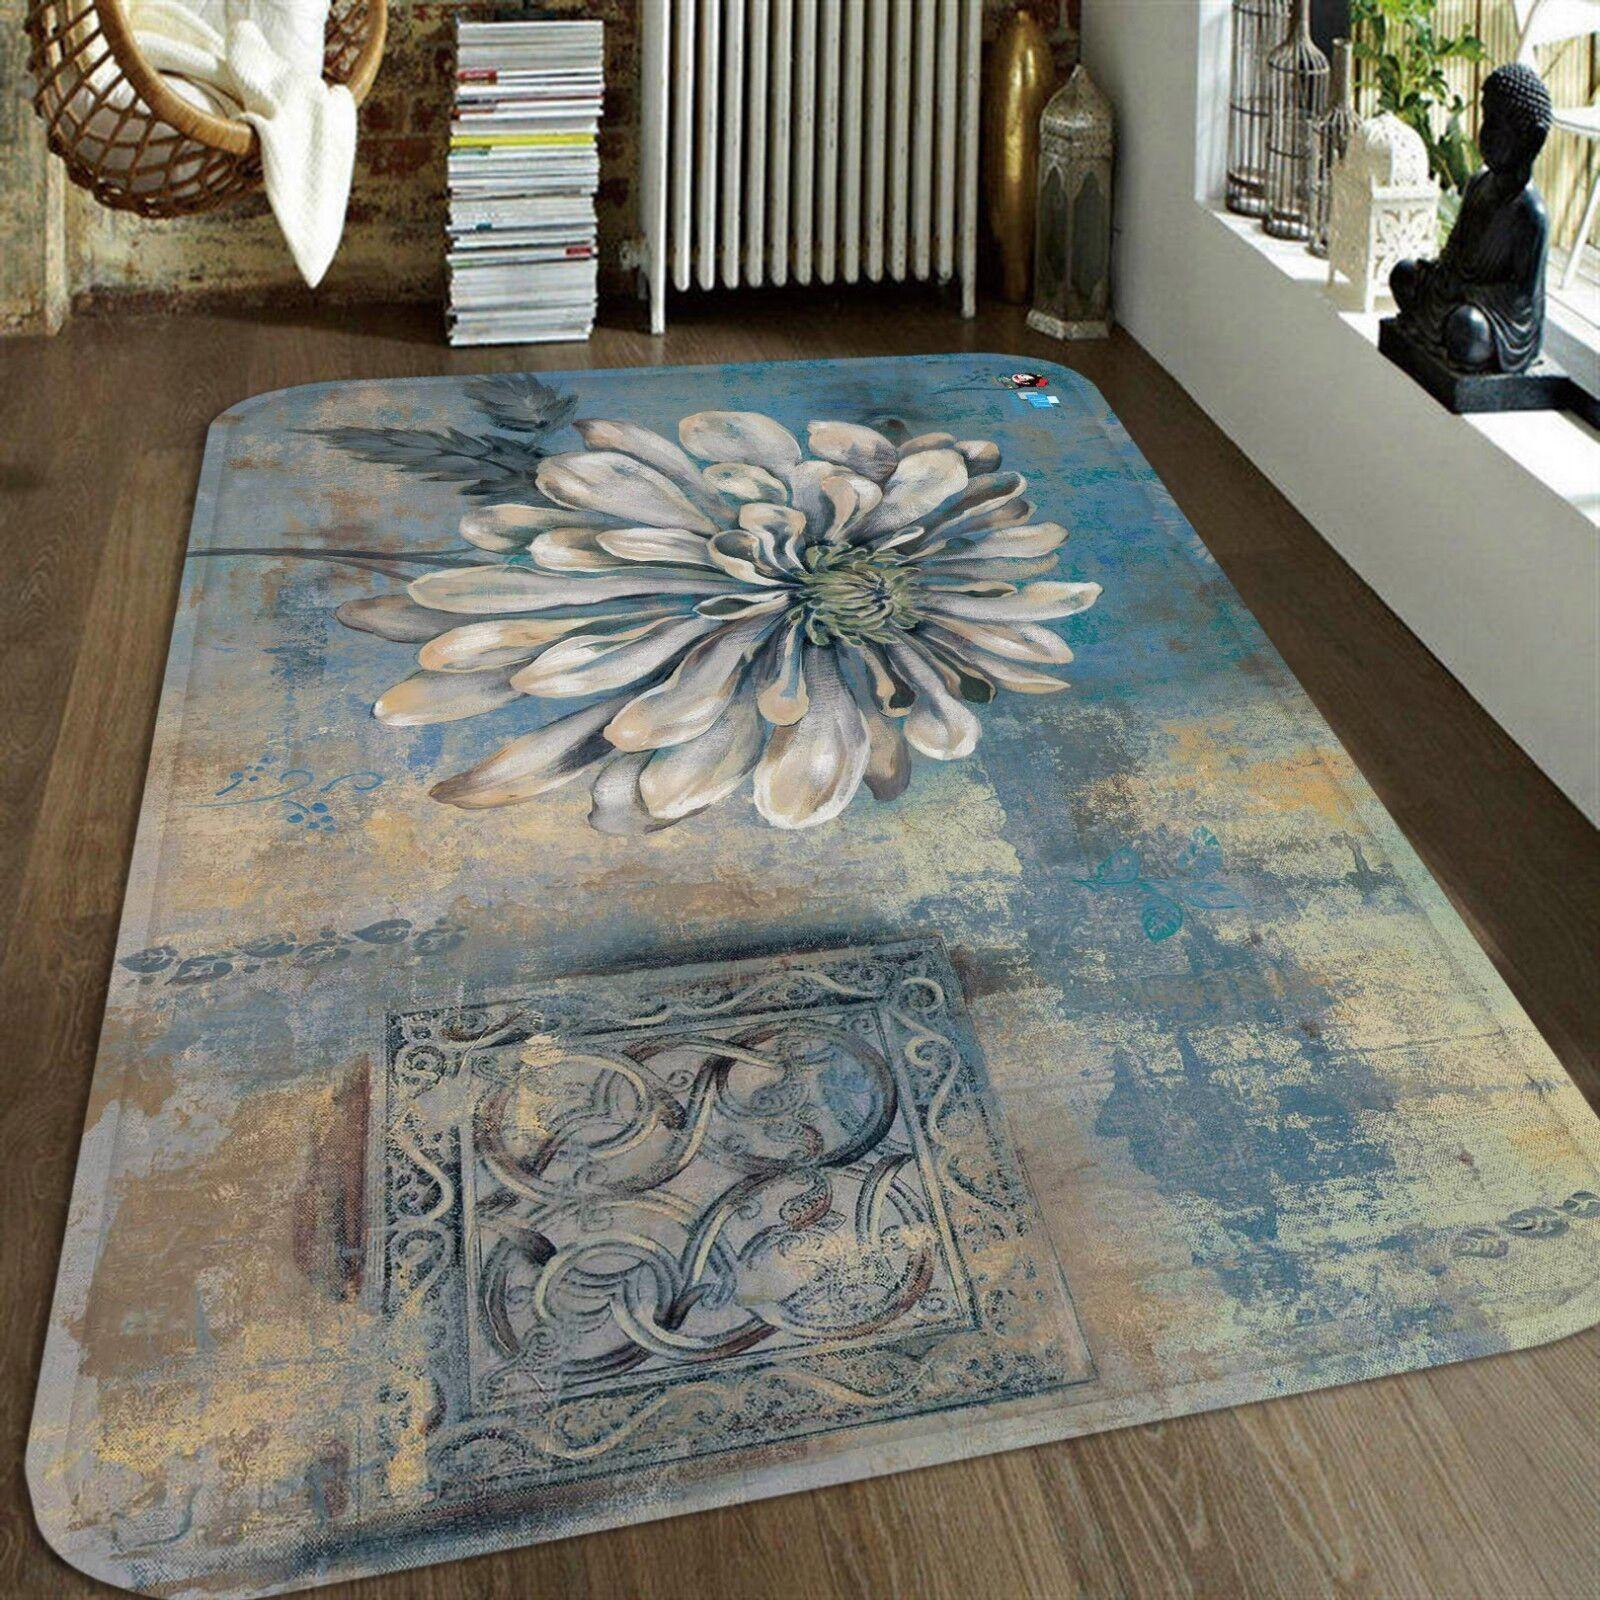 3D PETALI 12 tappetino antiscivolo tappeto camera Tappetino Qualità Elegante foto Tappeto UK Estate